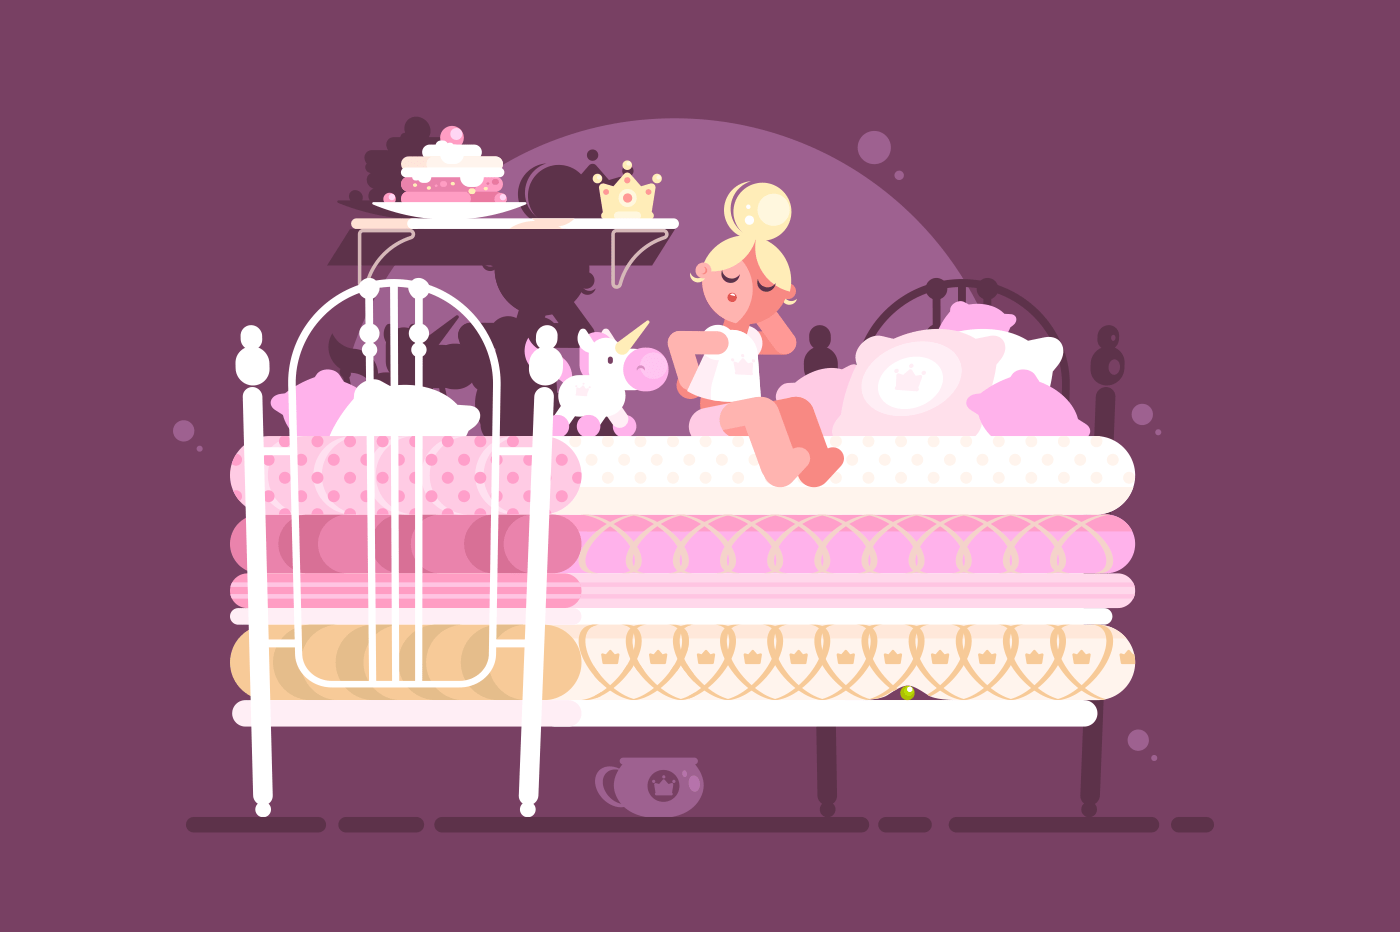 Little princess on pea. Girl slept on uncomfortable bed. Vector illustration